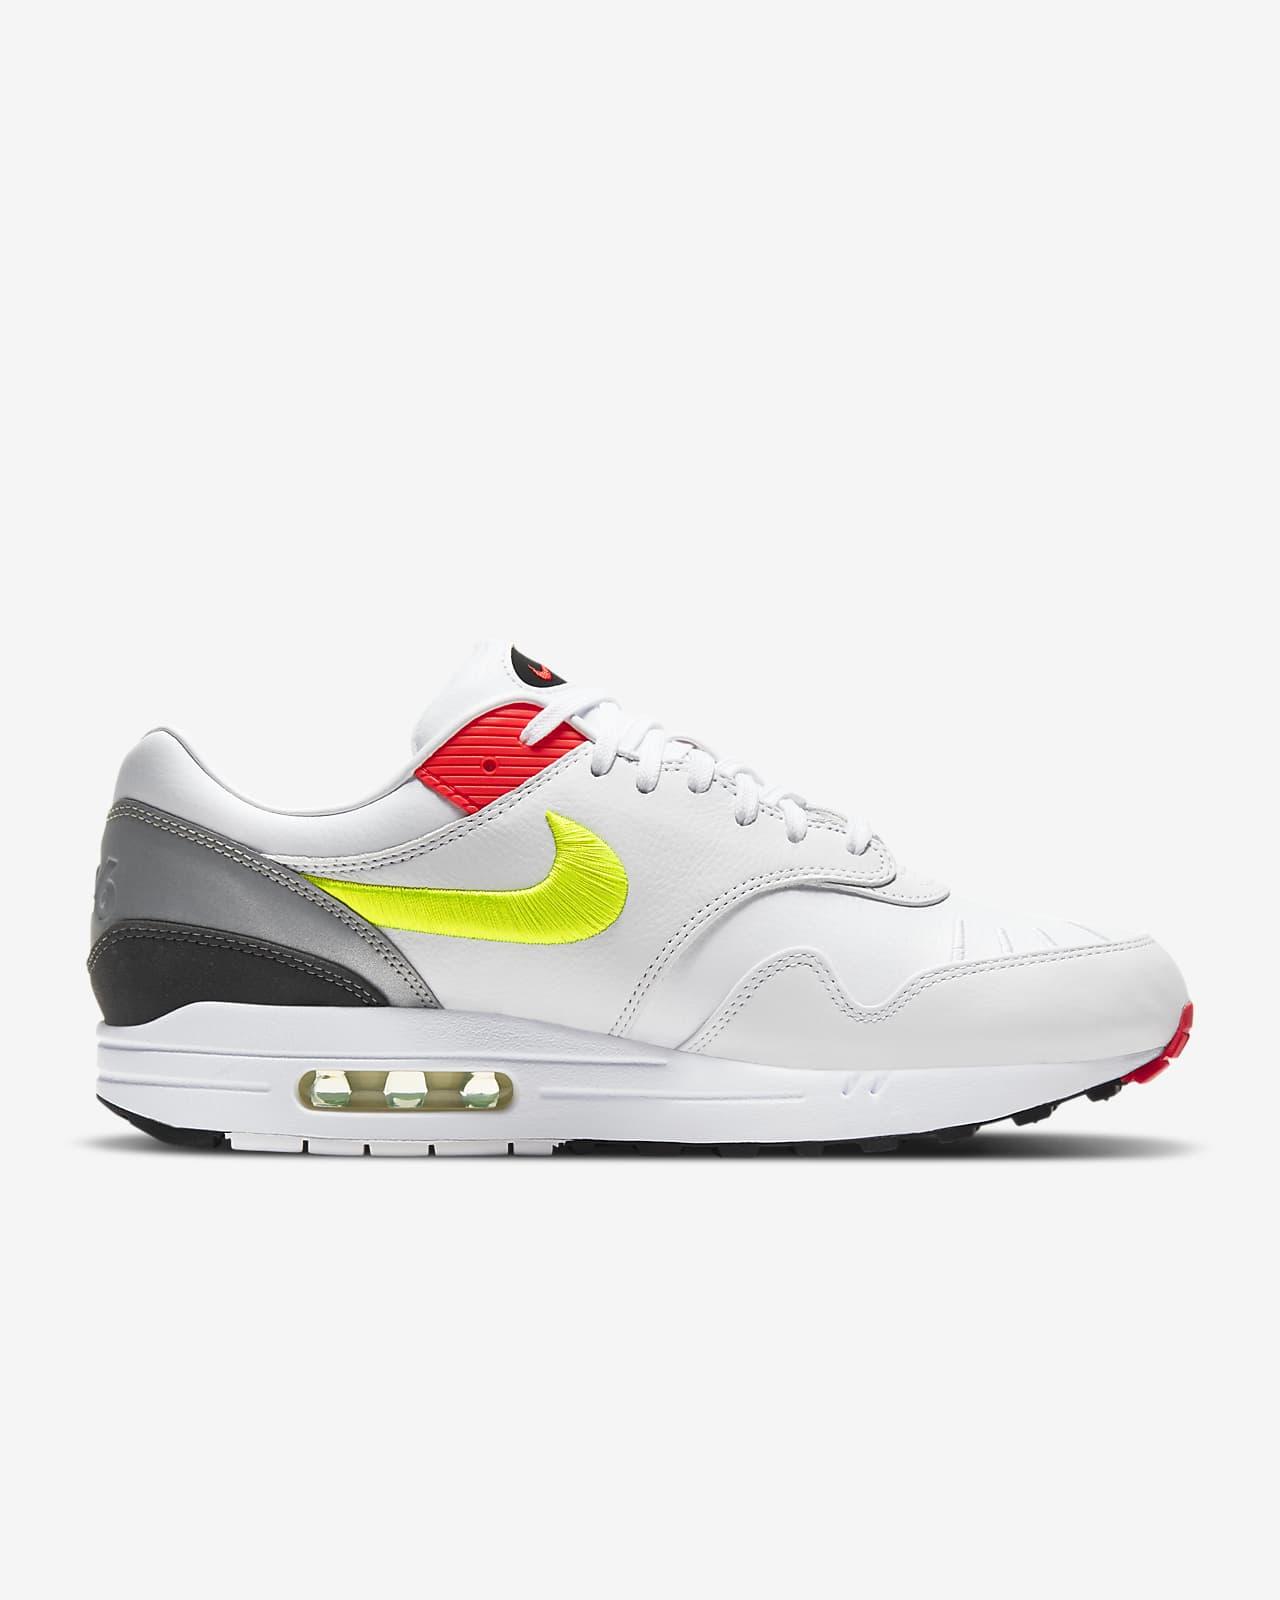 Nike Air Max 1 EOI Men's Shoes. Nike MY